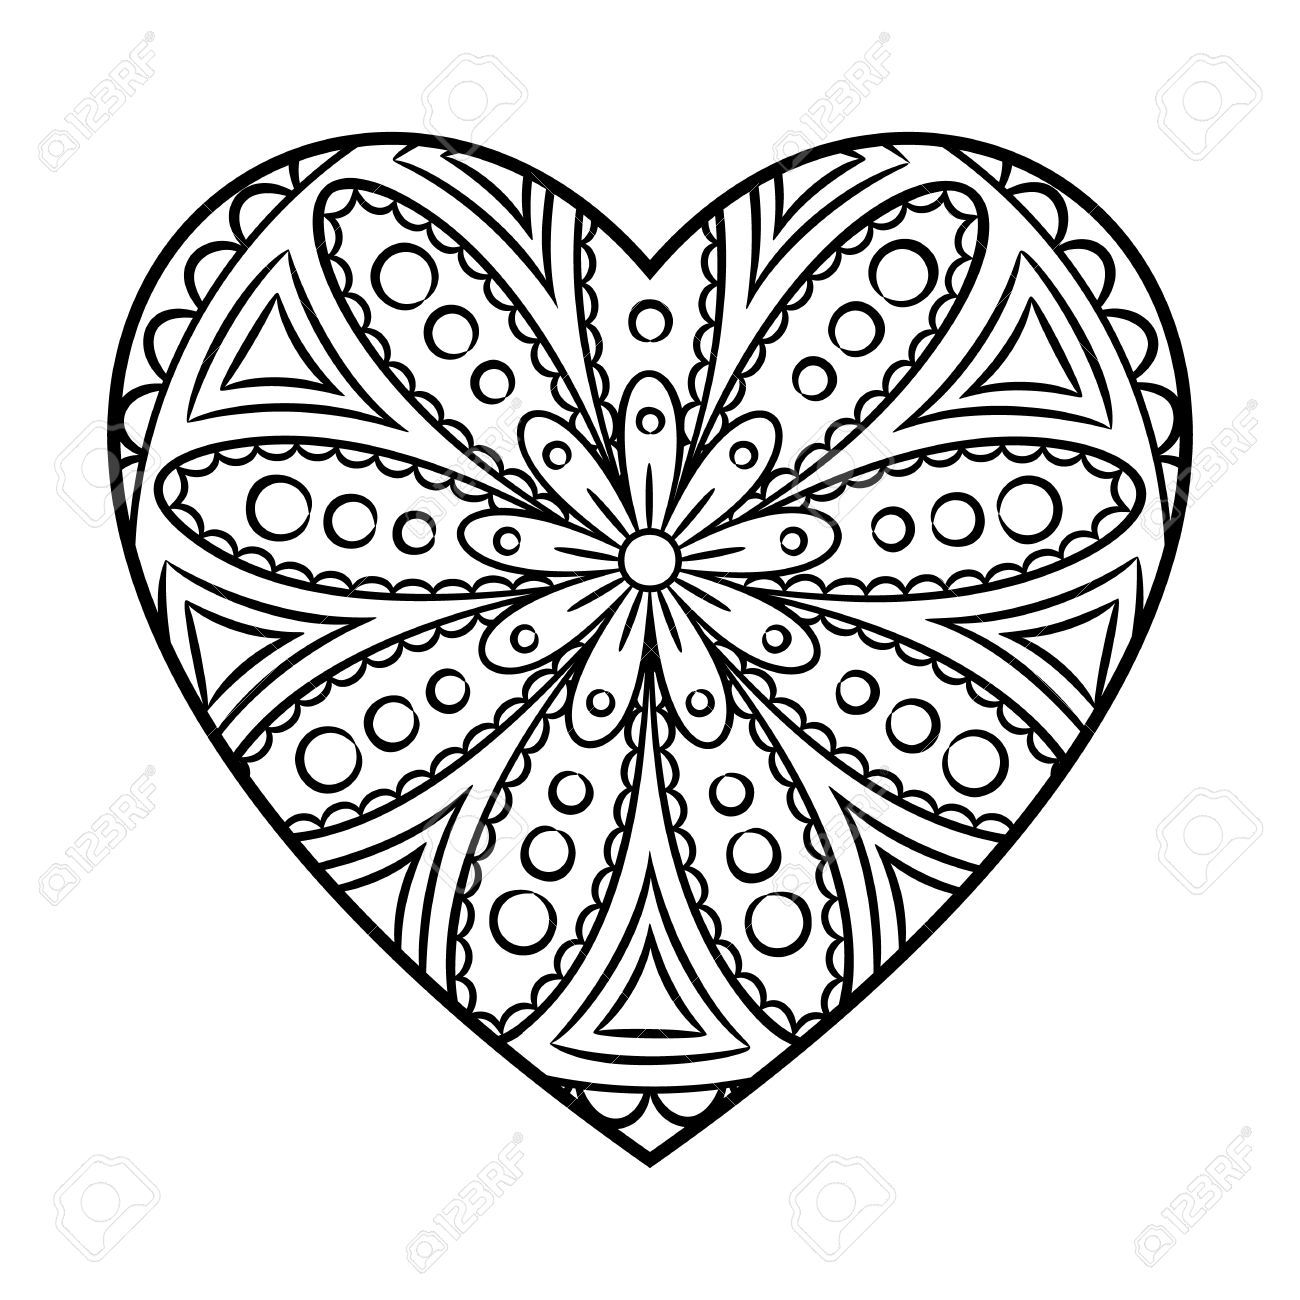 1300x1300 Marvelous Doodle Heart Mandala Coloring Page Outline Floral Design